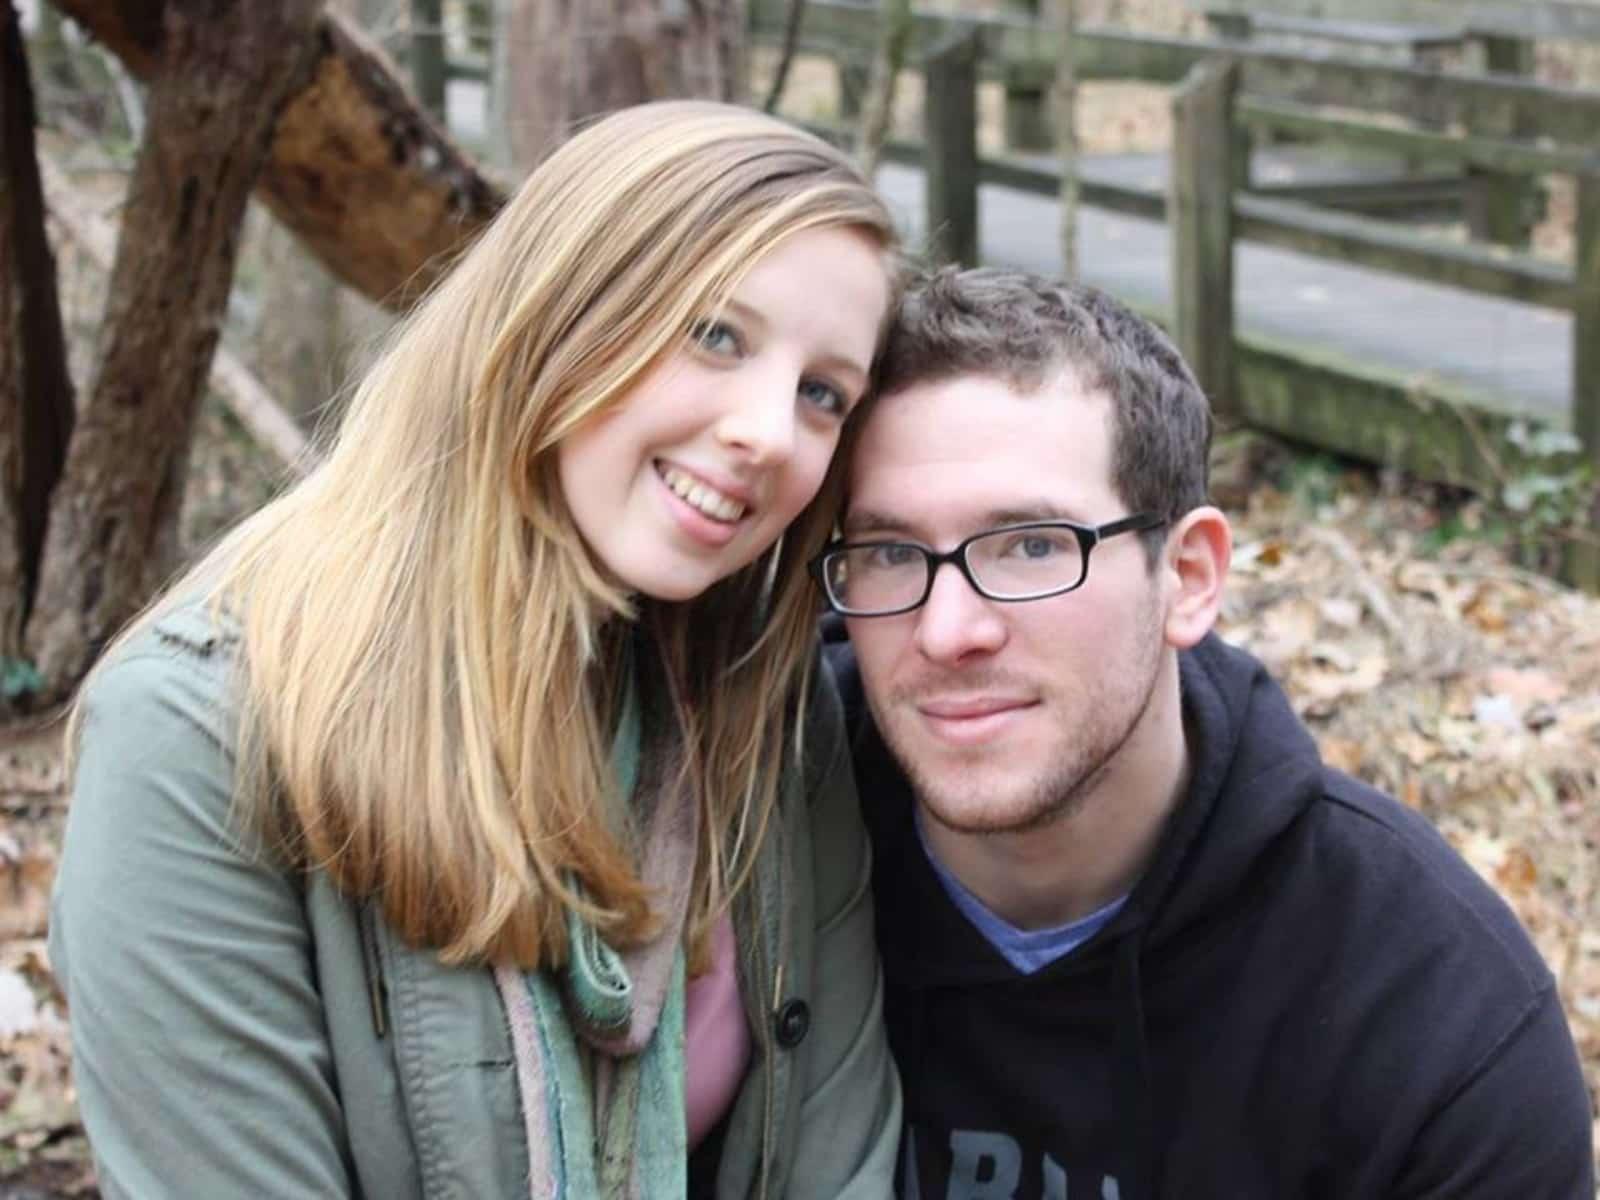 David & Ashley from Coimbra, Portugal